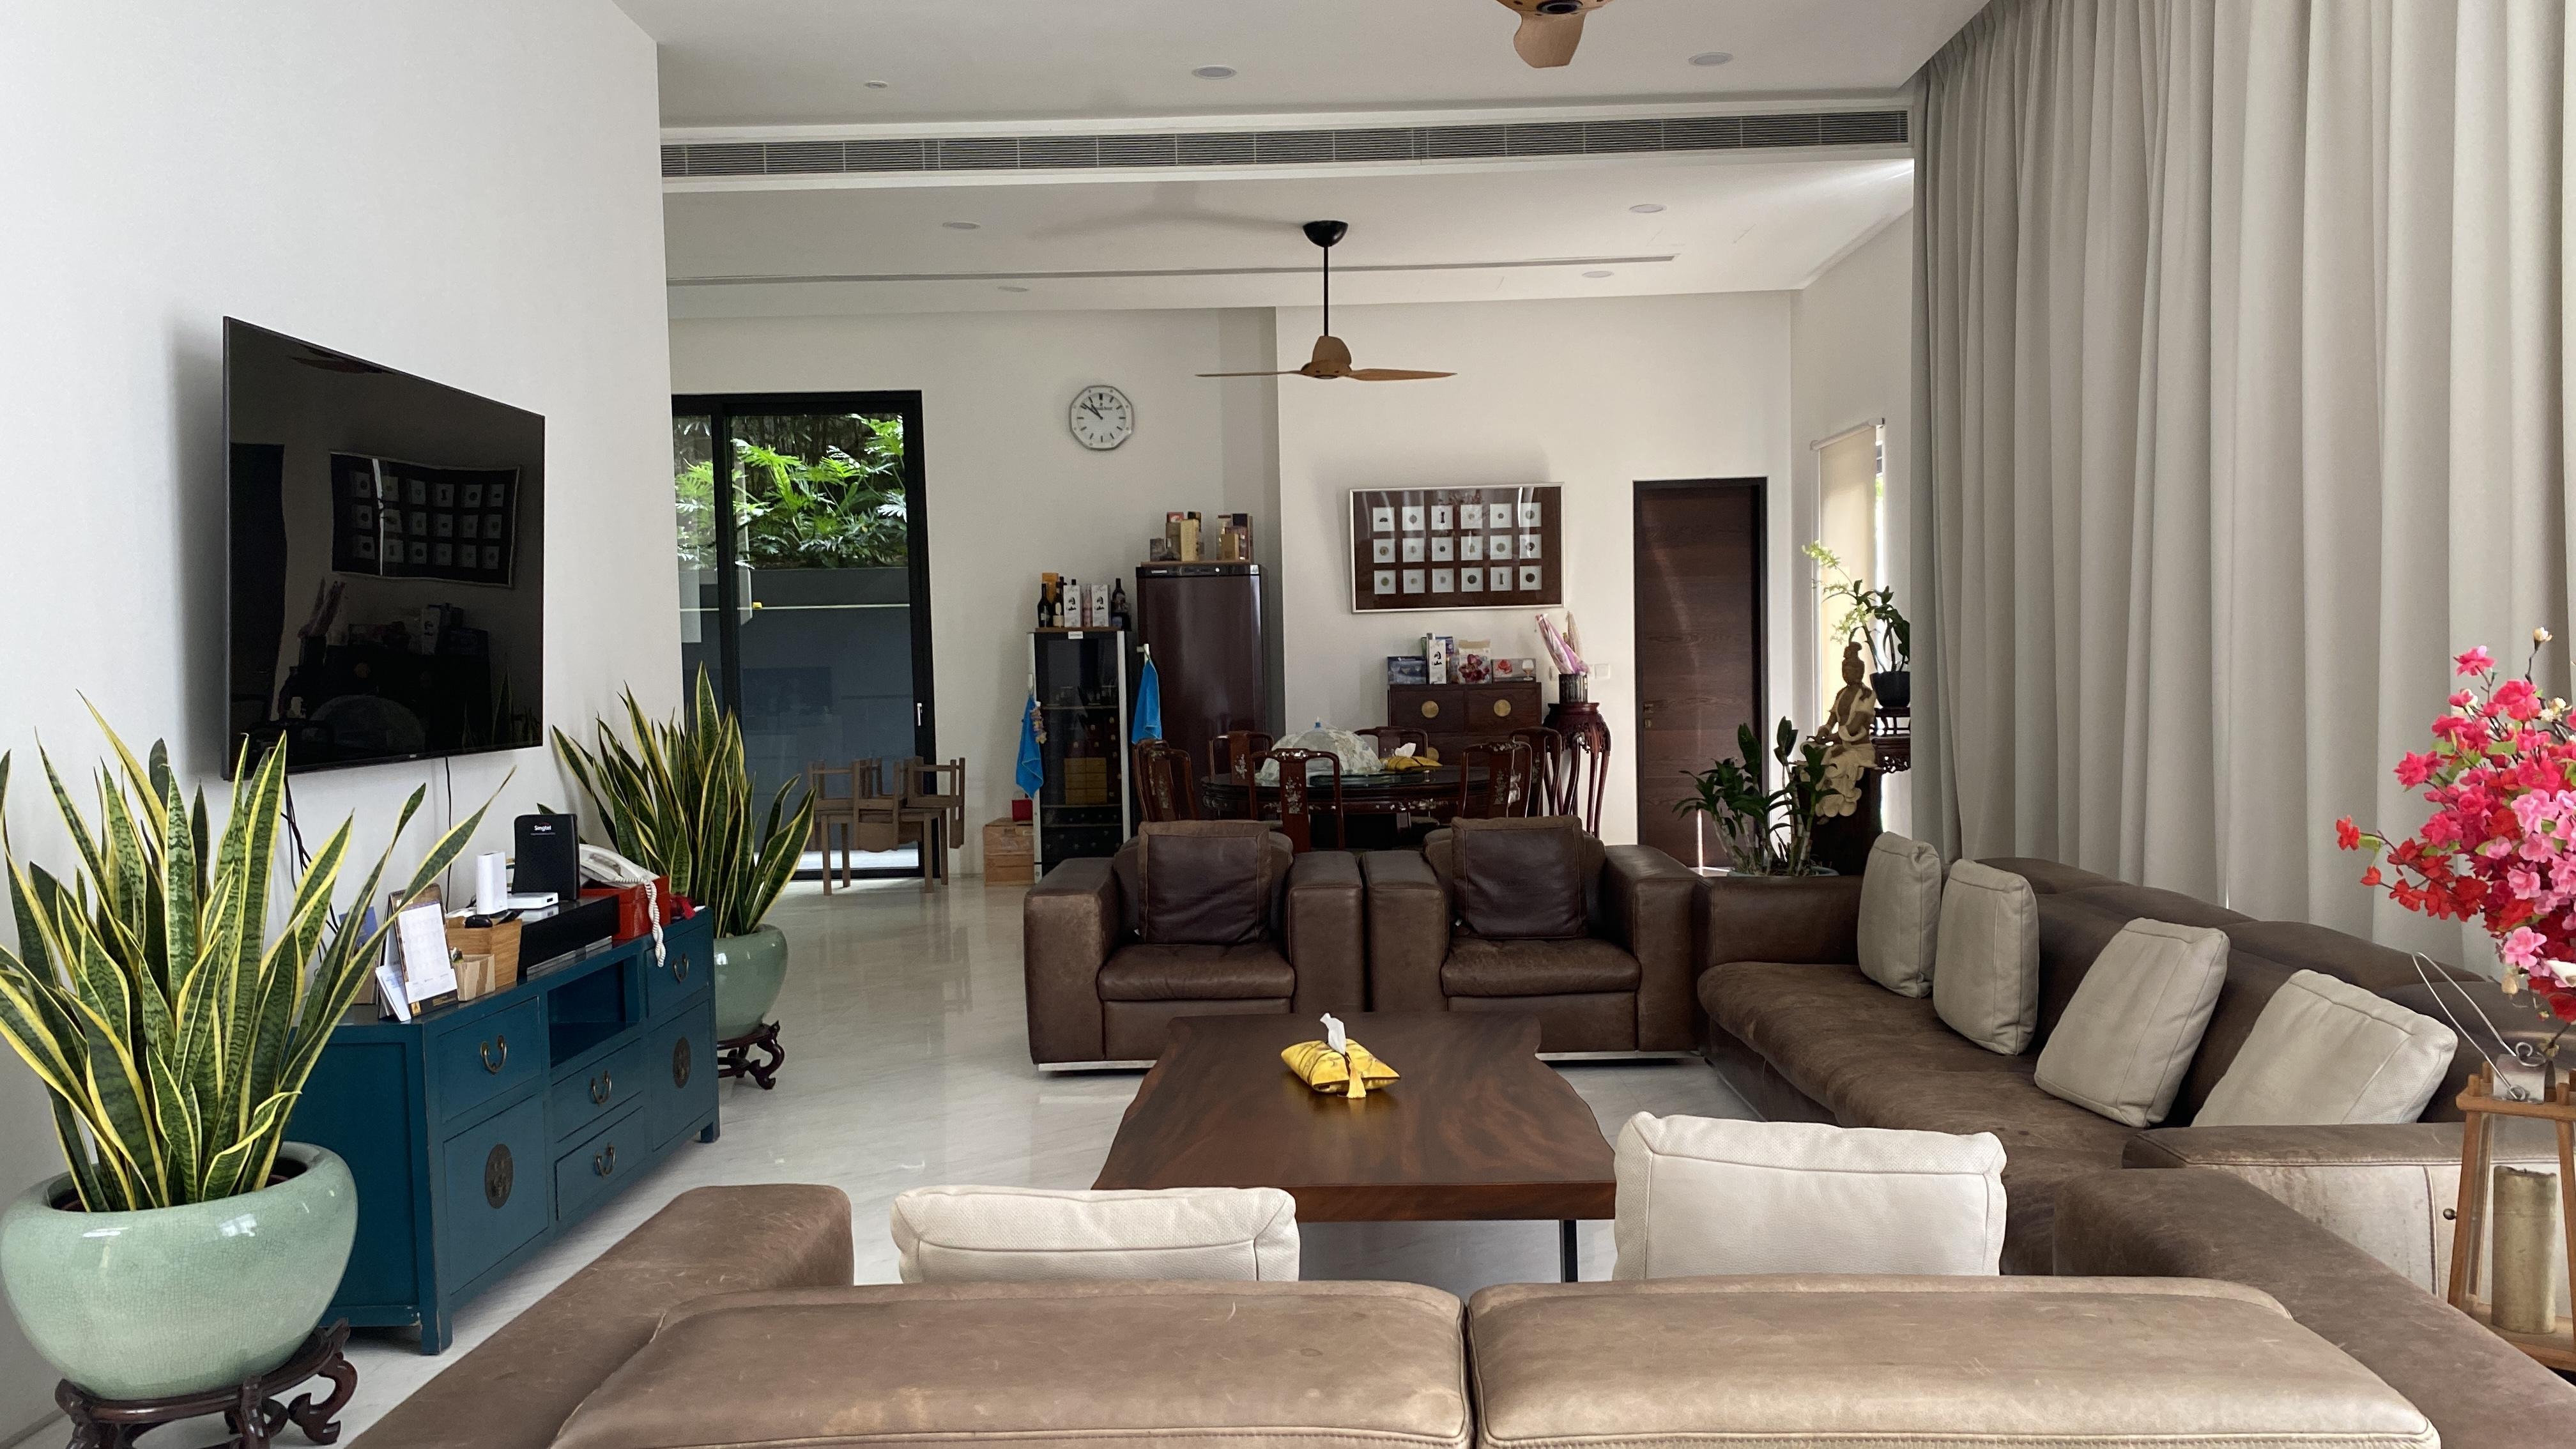 Raffles Park Modern Bungalow House #130567603